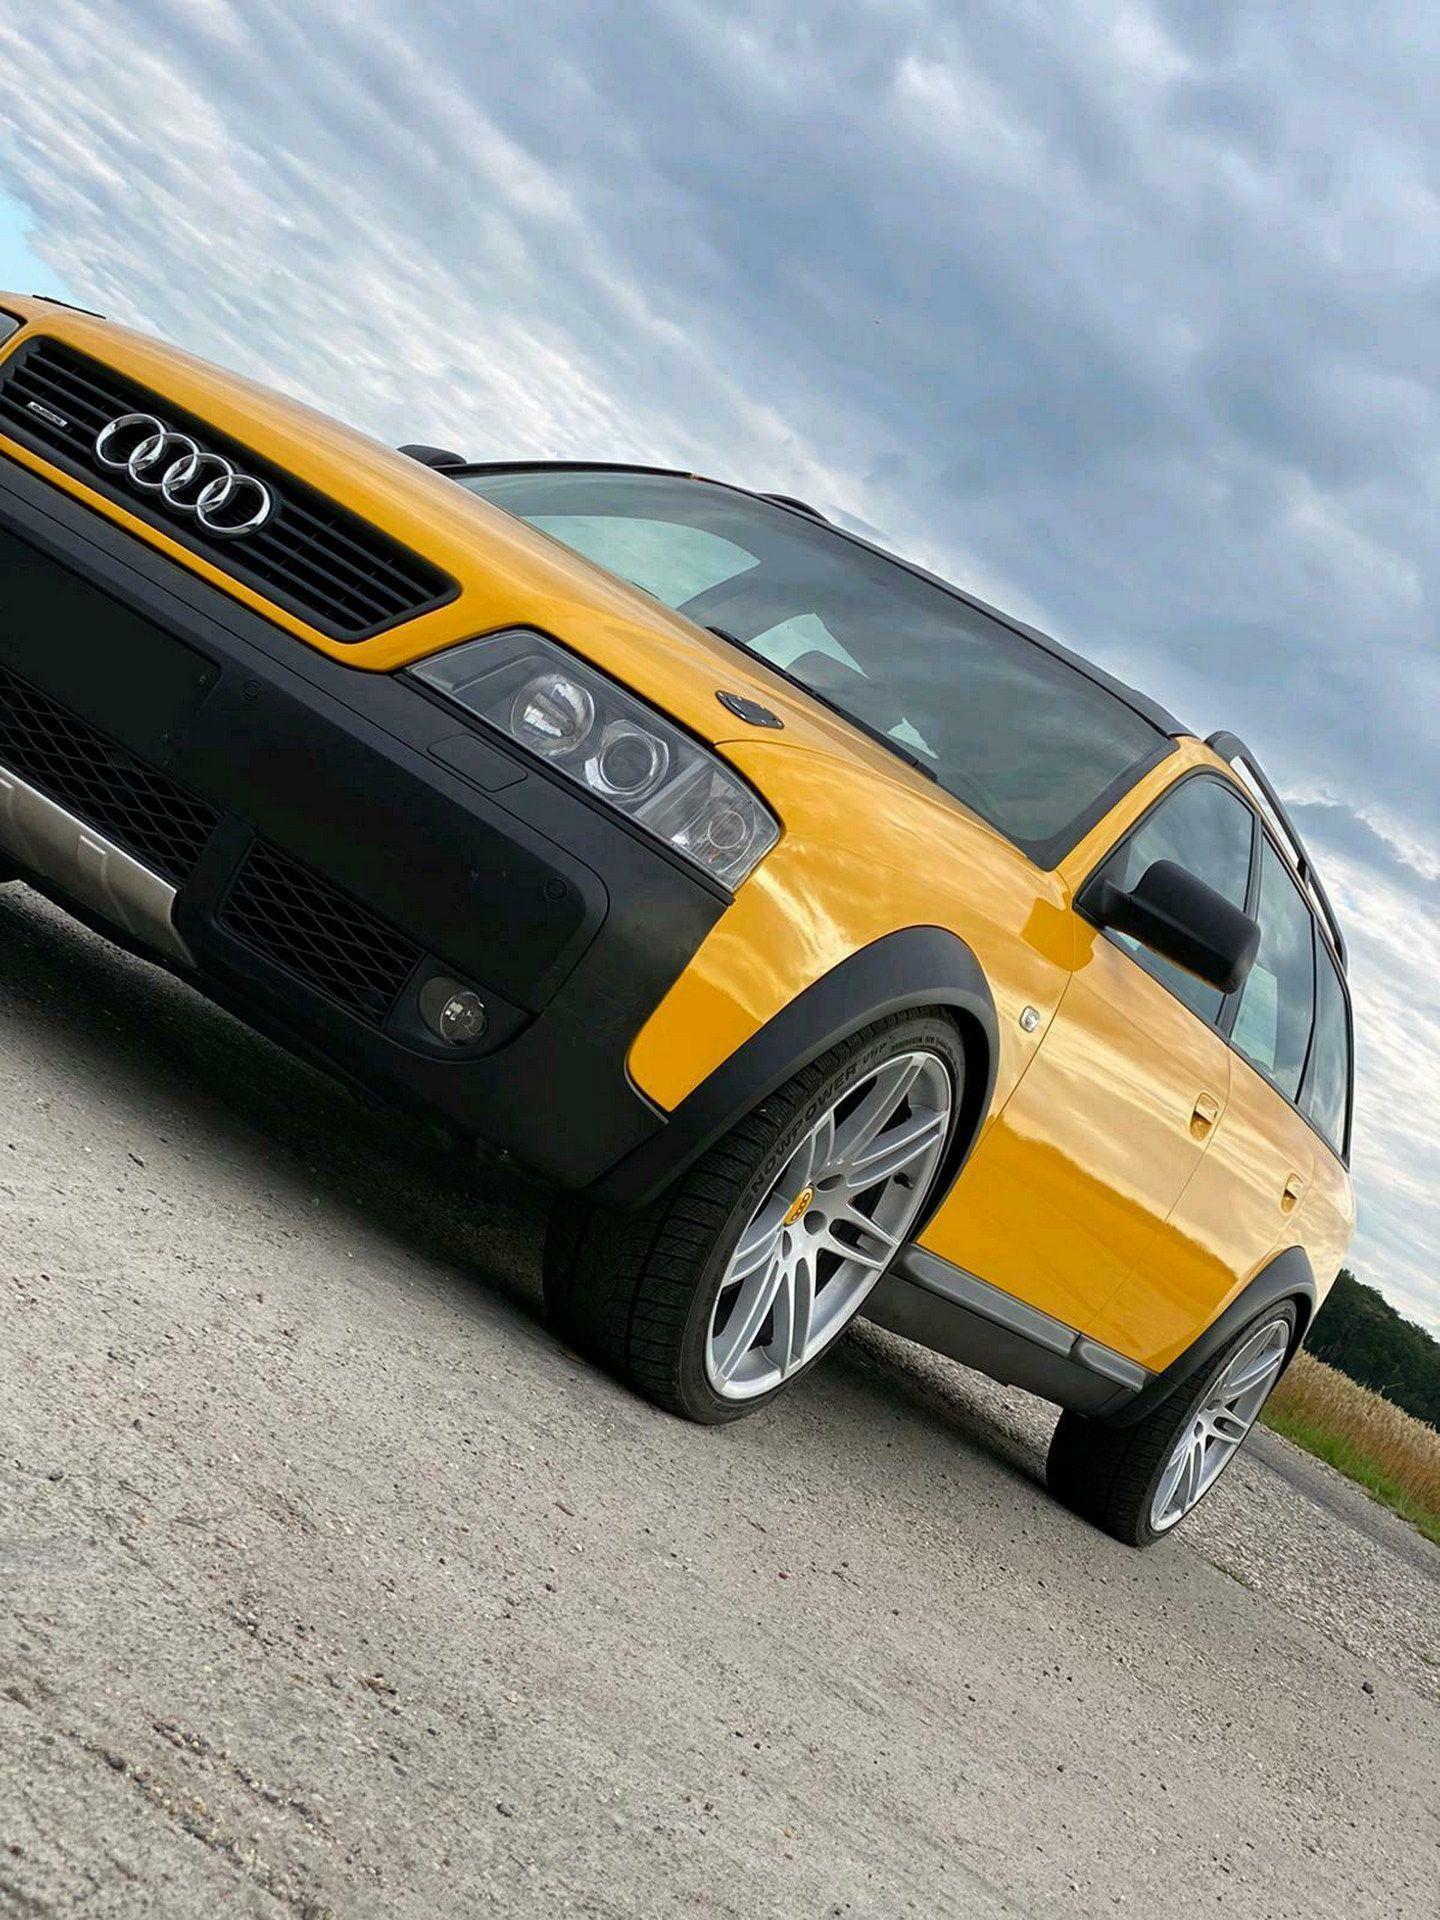 Audi-RS6-Allroad-Custom-Build-2.jpg